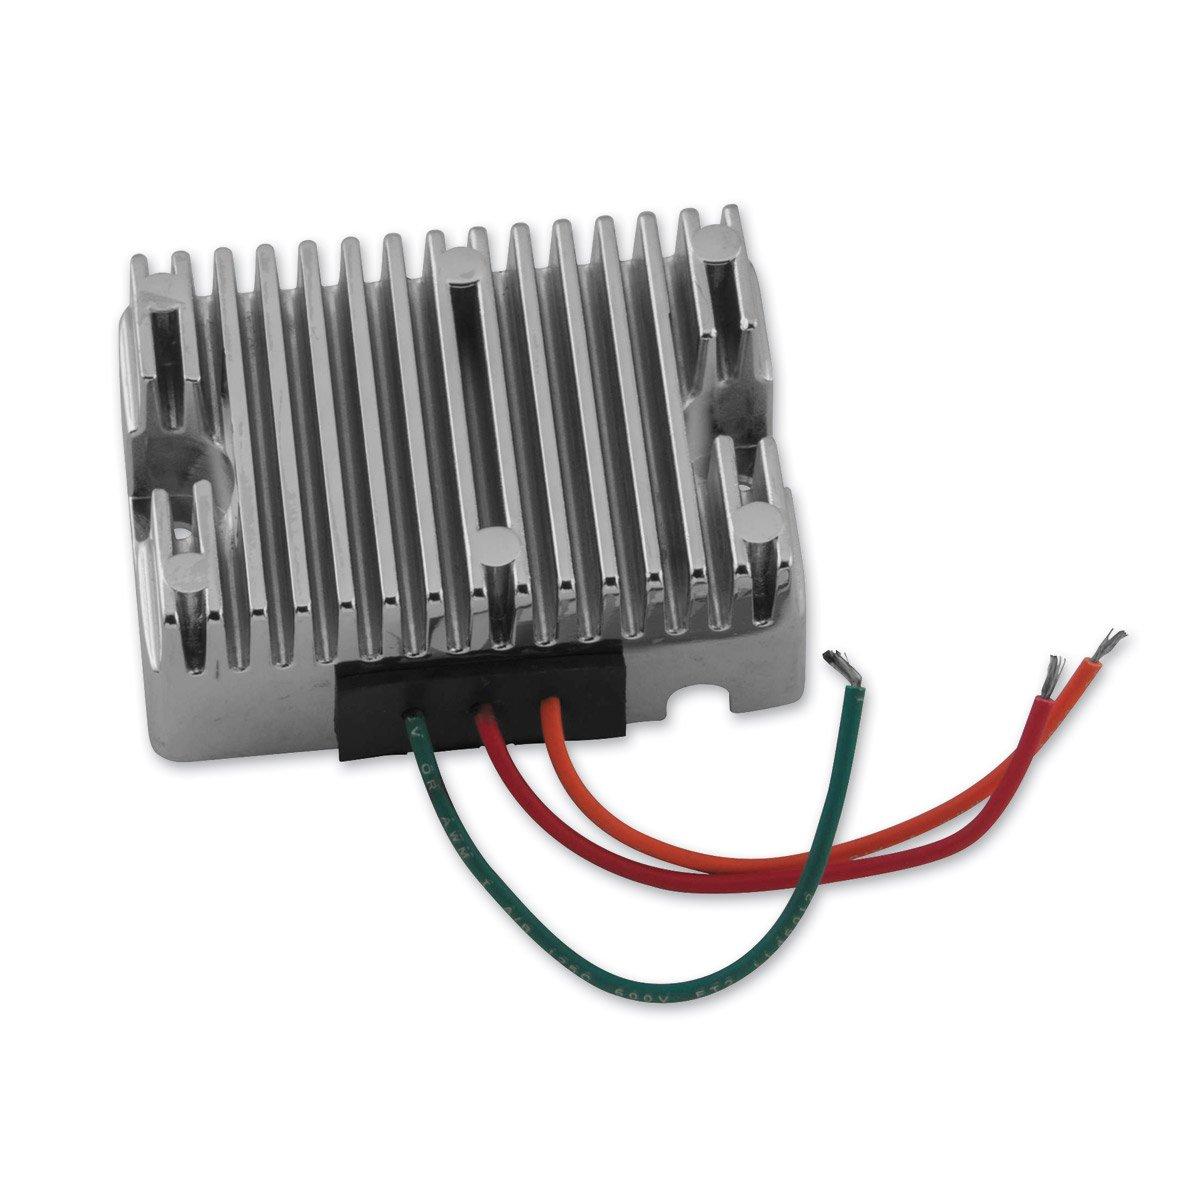 Twin Power TWIN POWER REGULATOR CH65-77 Sportster; 65-69 Big Twin 12 Volt OEM# 74510-64 H614C